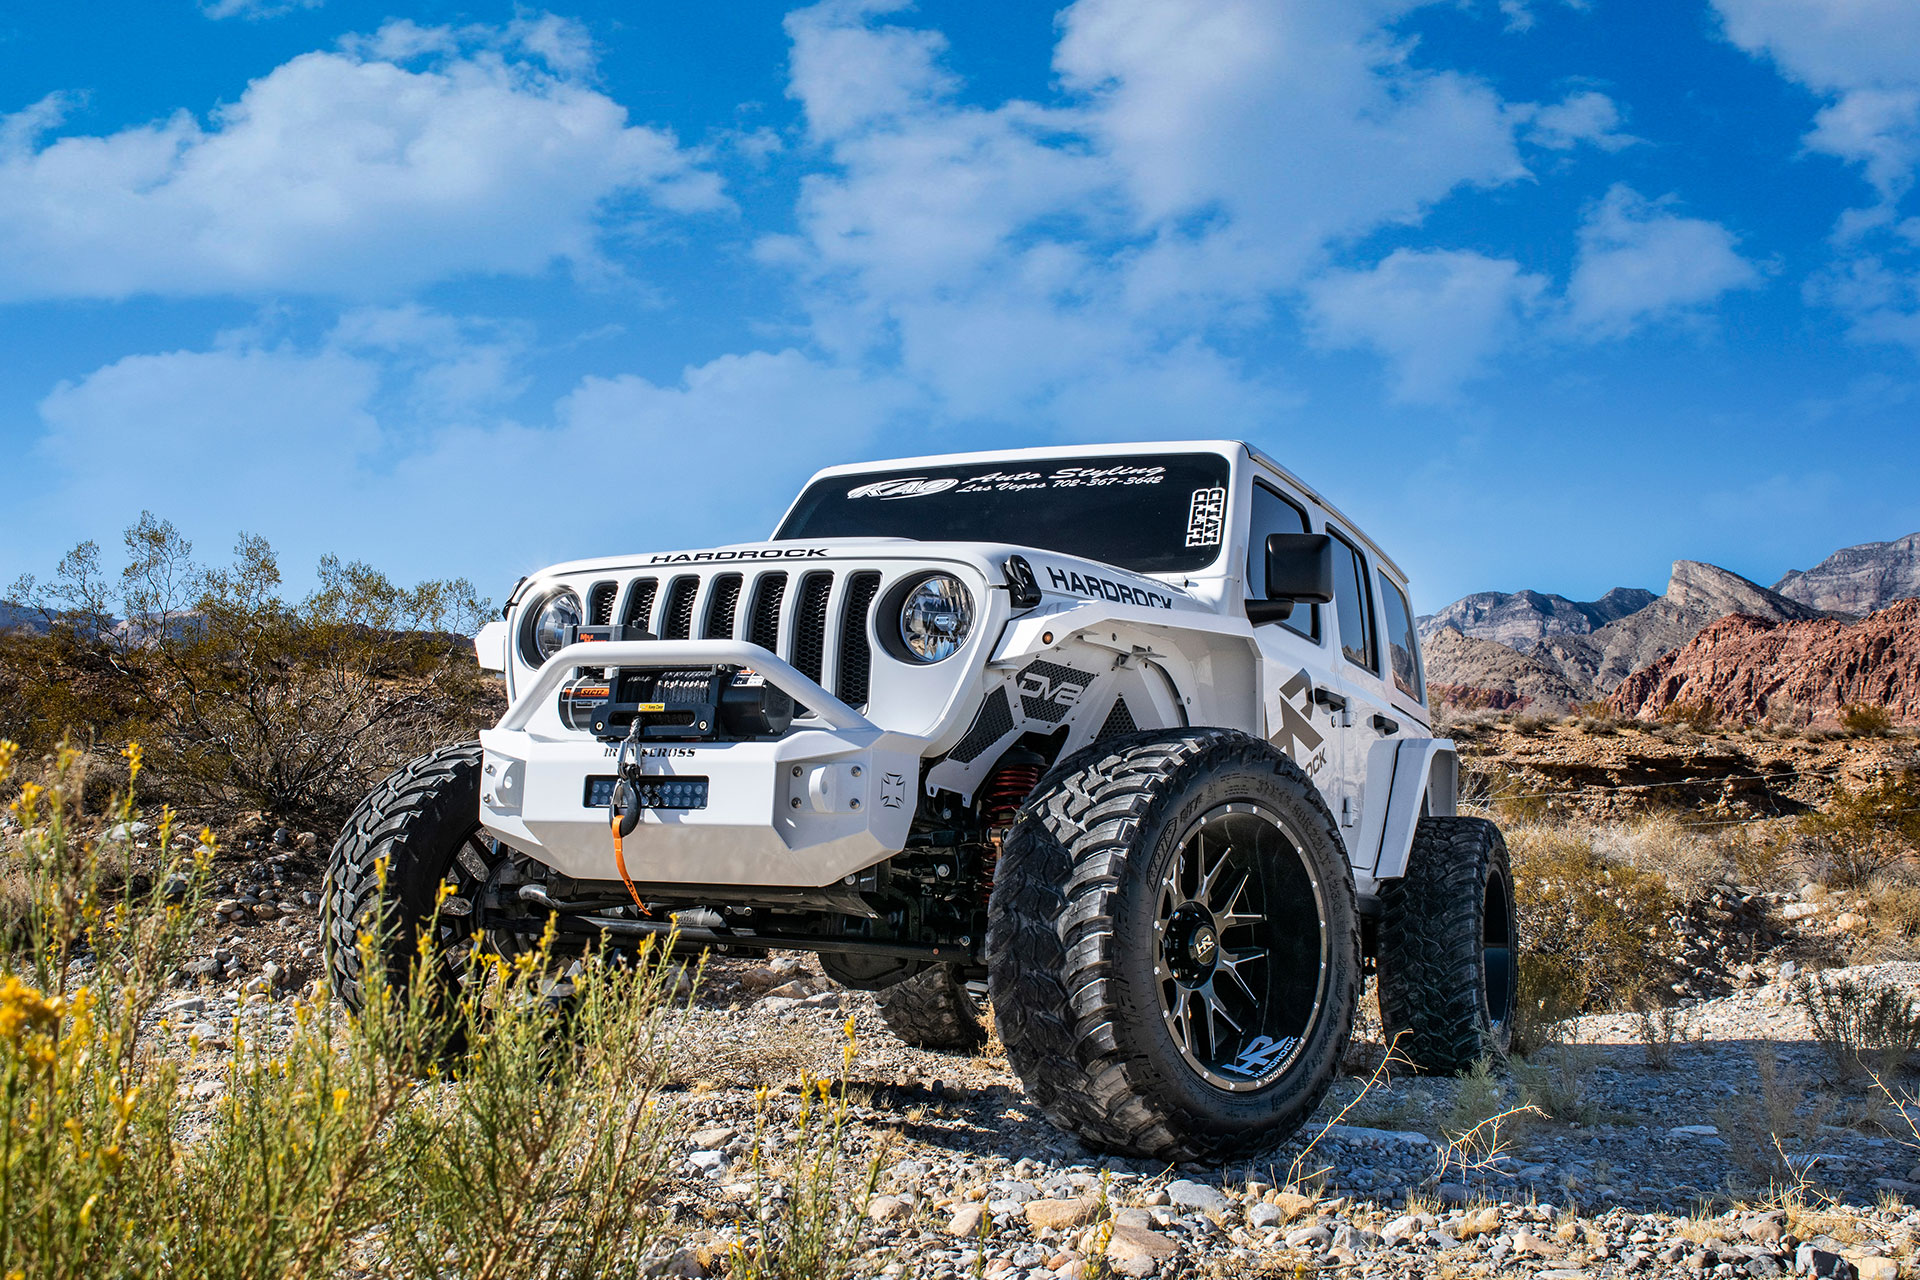 Hardrock H500 Affliction Xposed - White Jeep Wrangler - SEMA Build